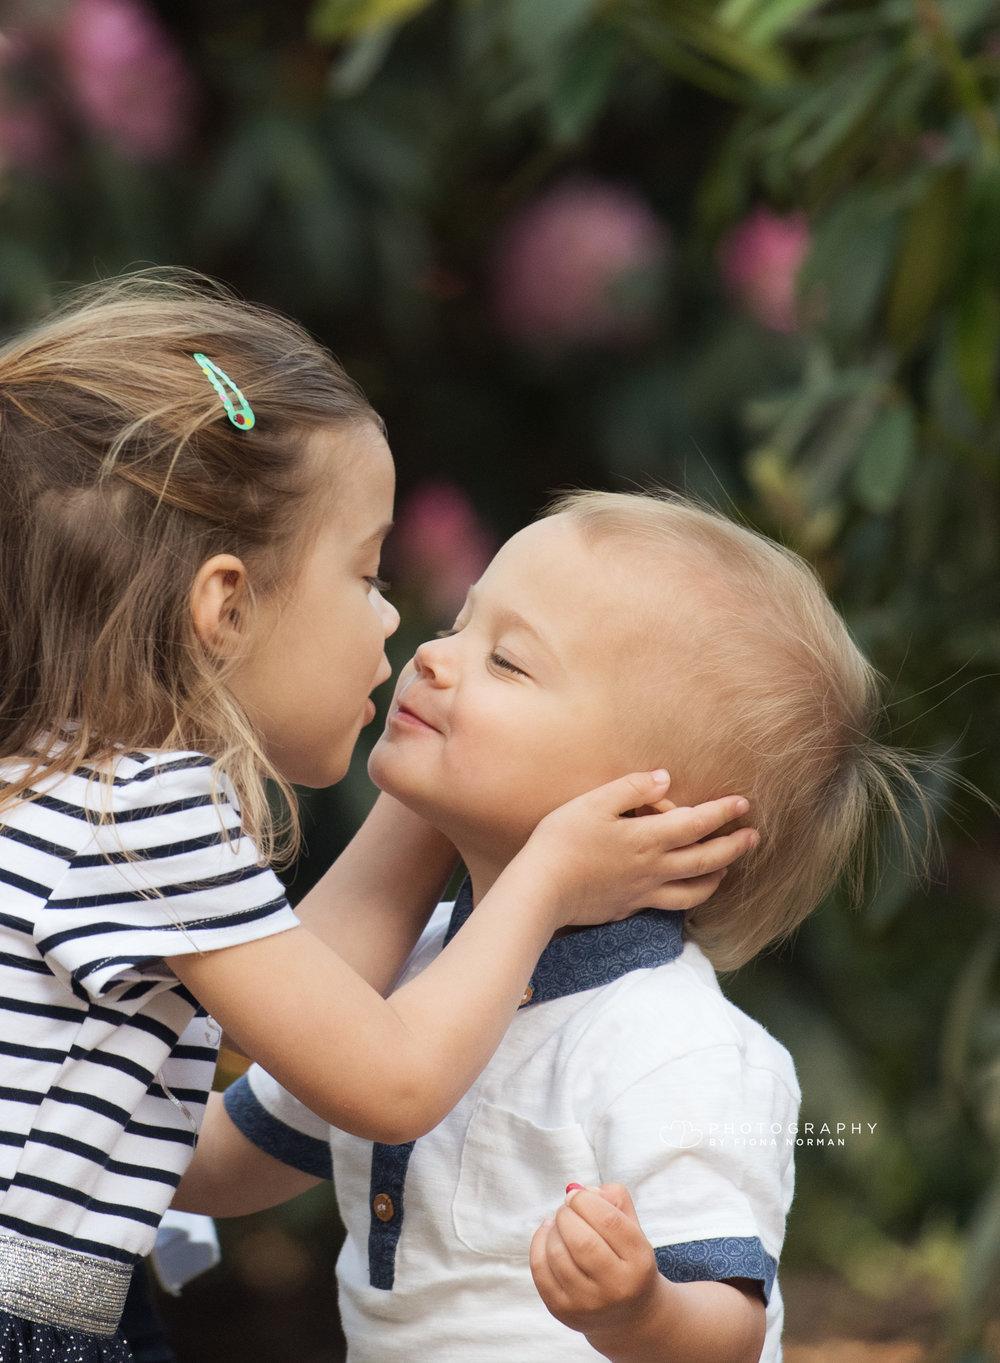 sister giving a kiss.jpg